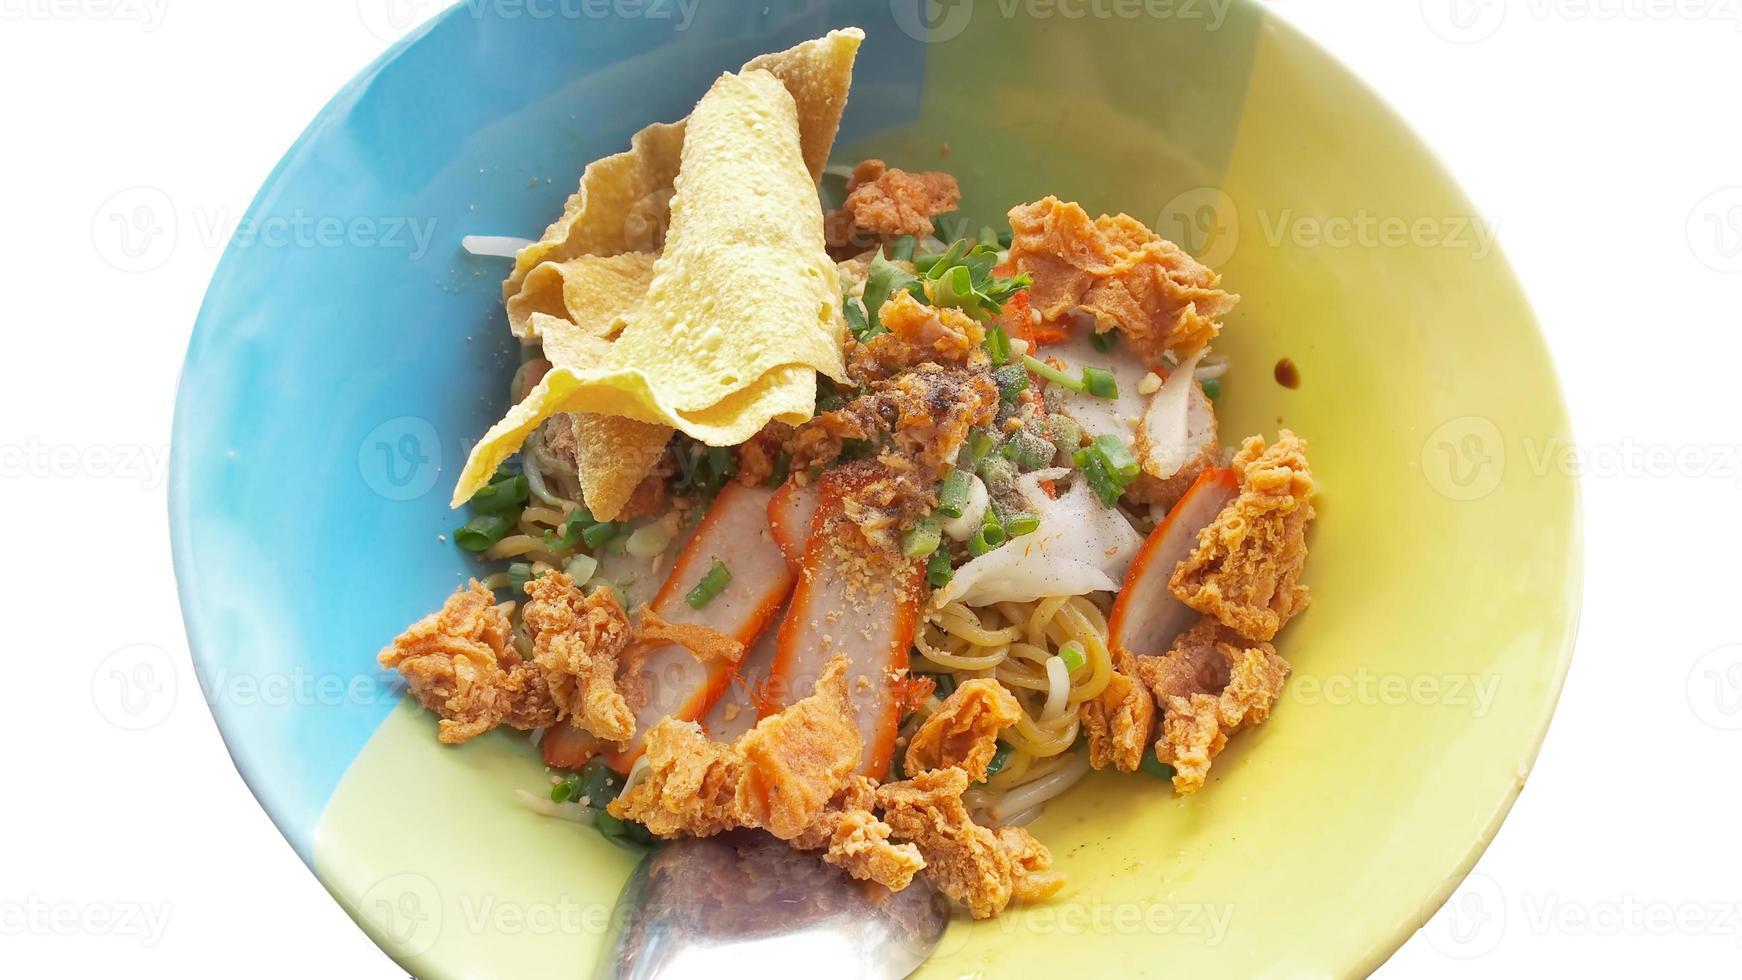 zuppa di noodles di maiale wonton foto